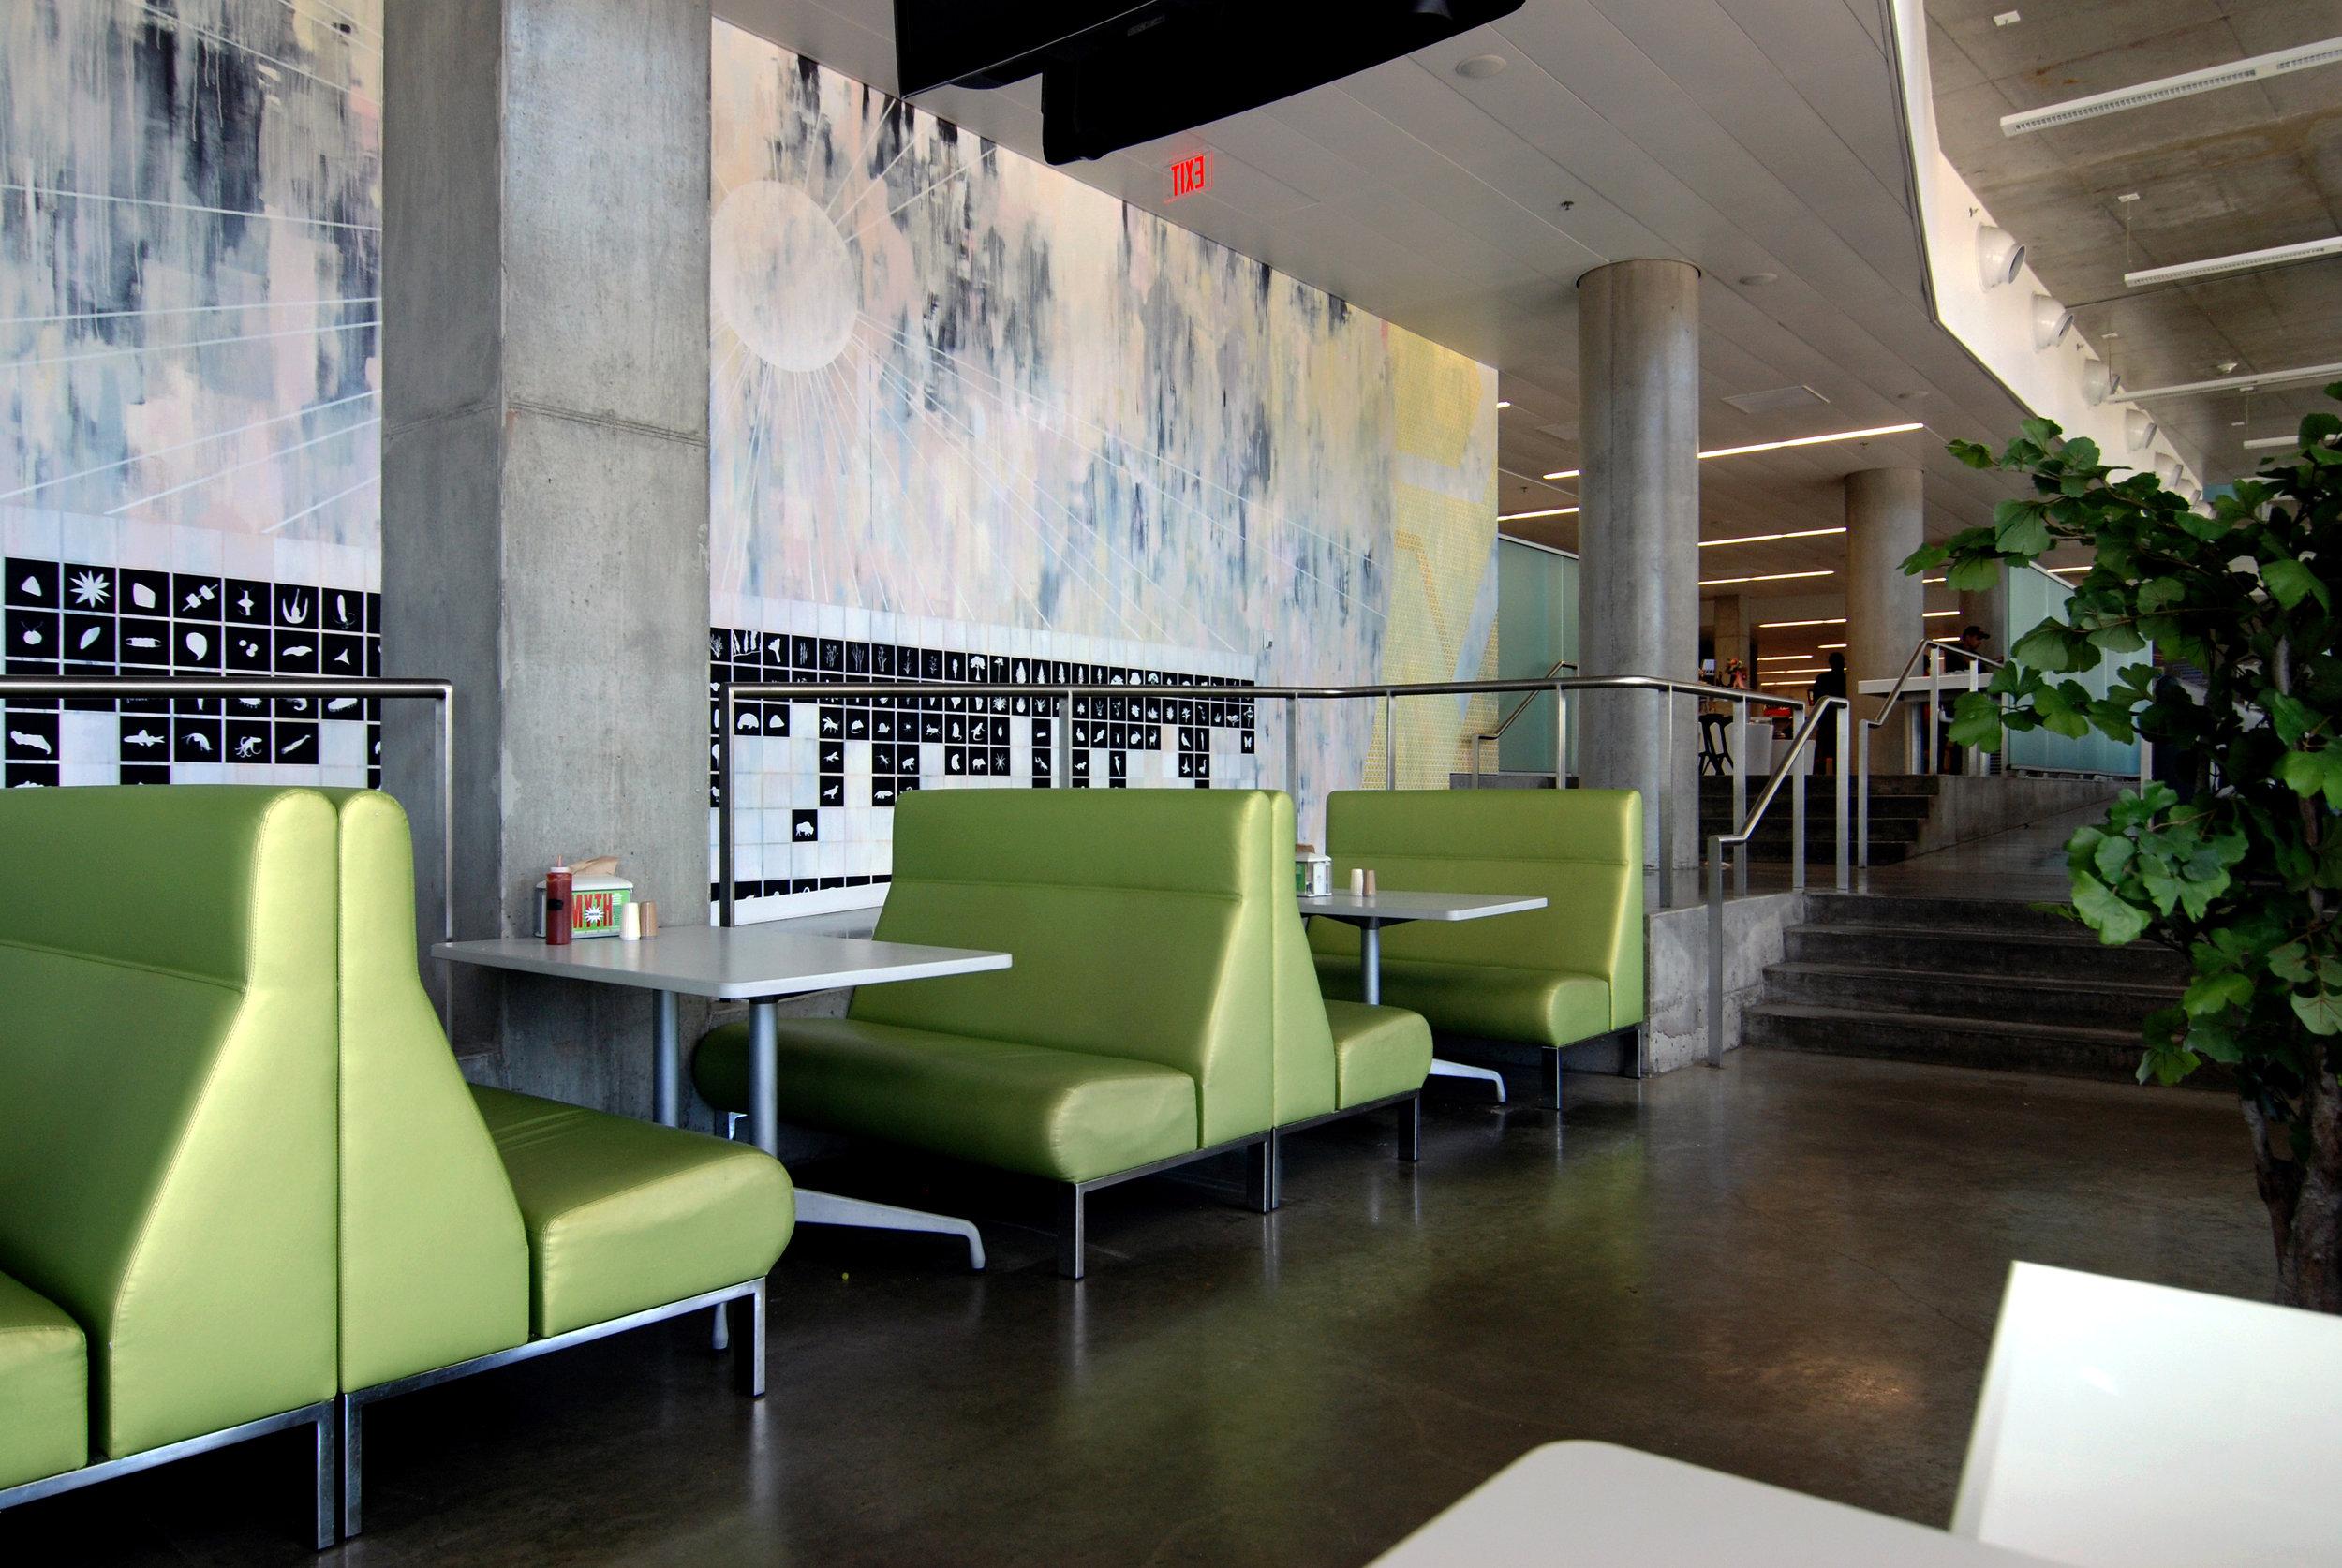 Ernie Davis Dinning Hall